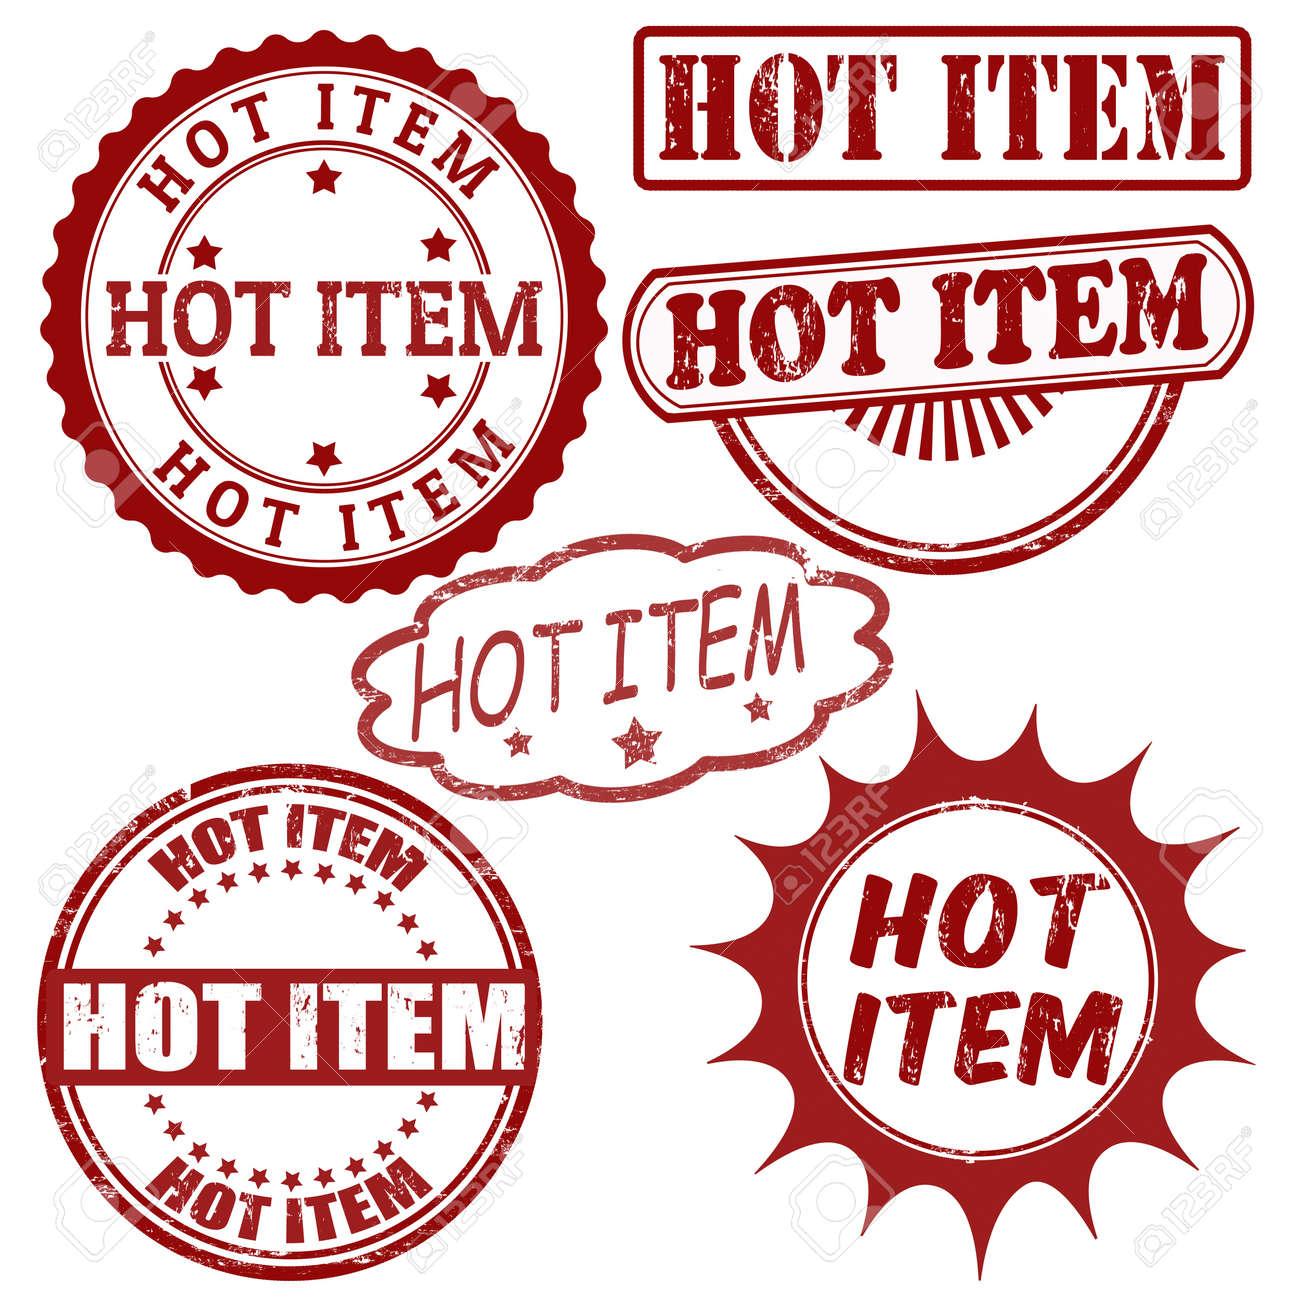 Set of Hot Item grunge rubber stamps, vector illustration Stock Vector - 22068918